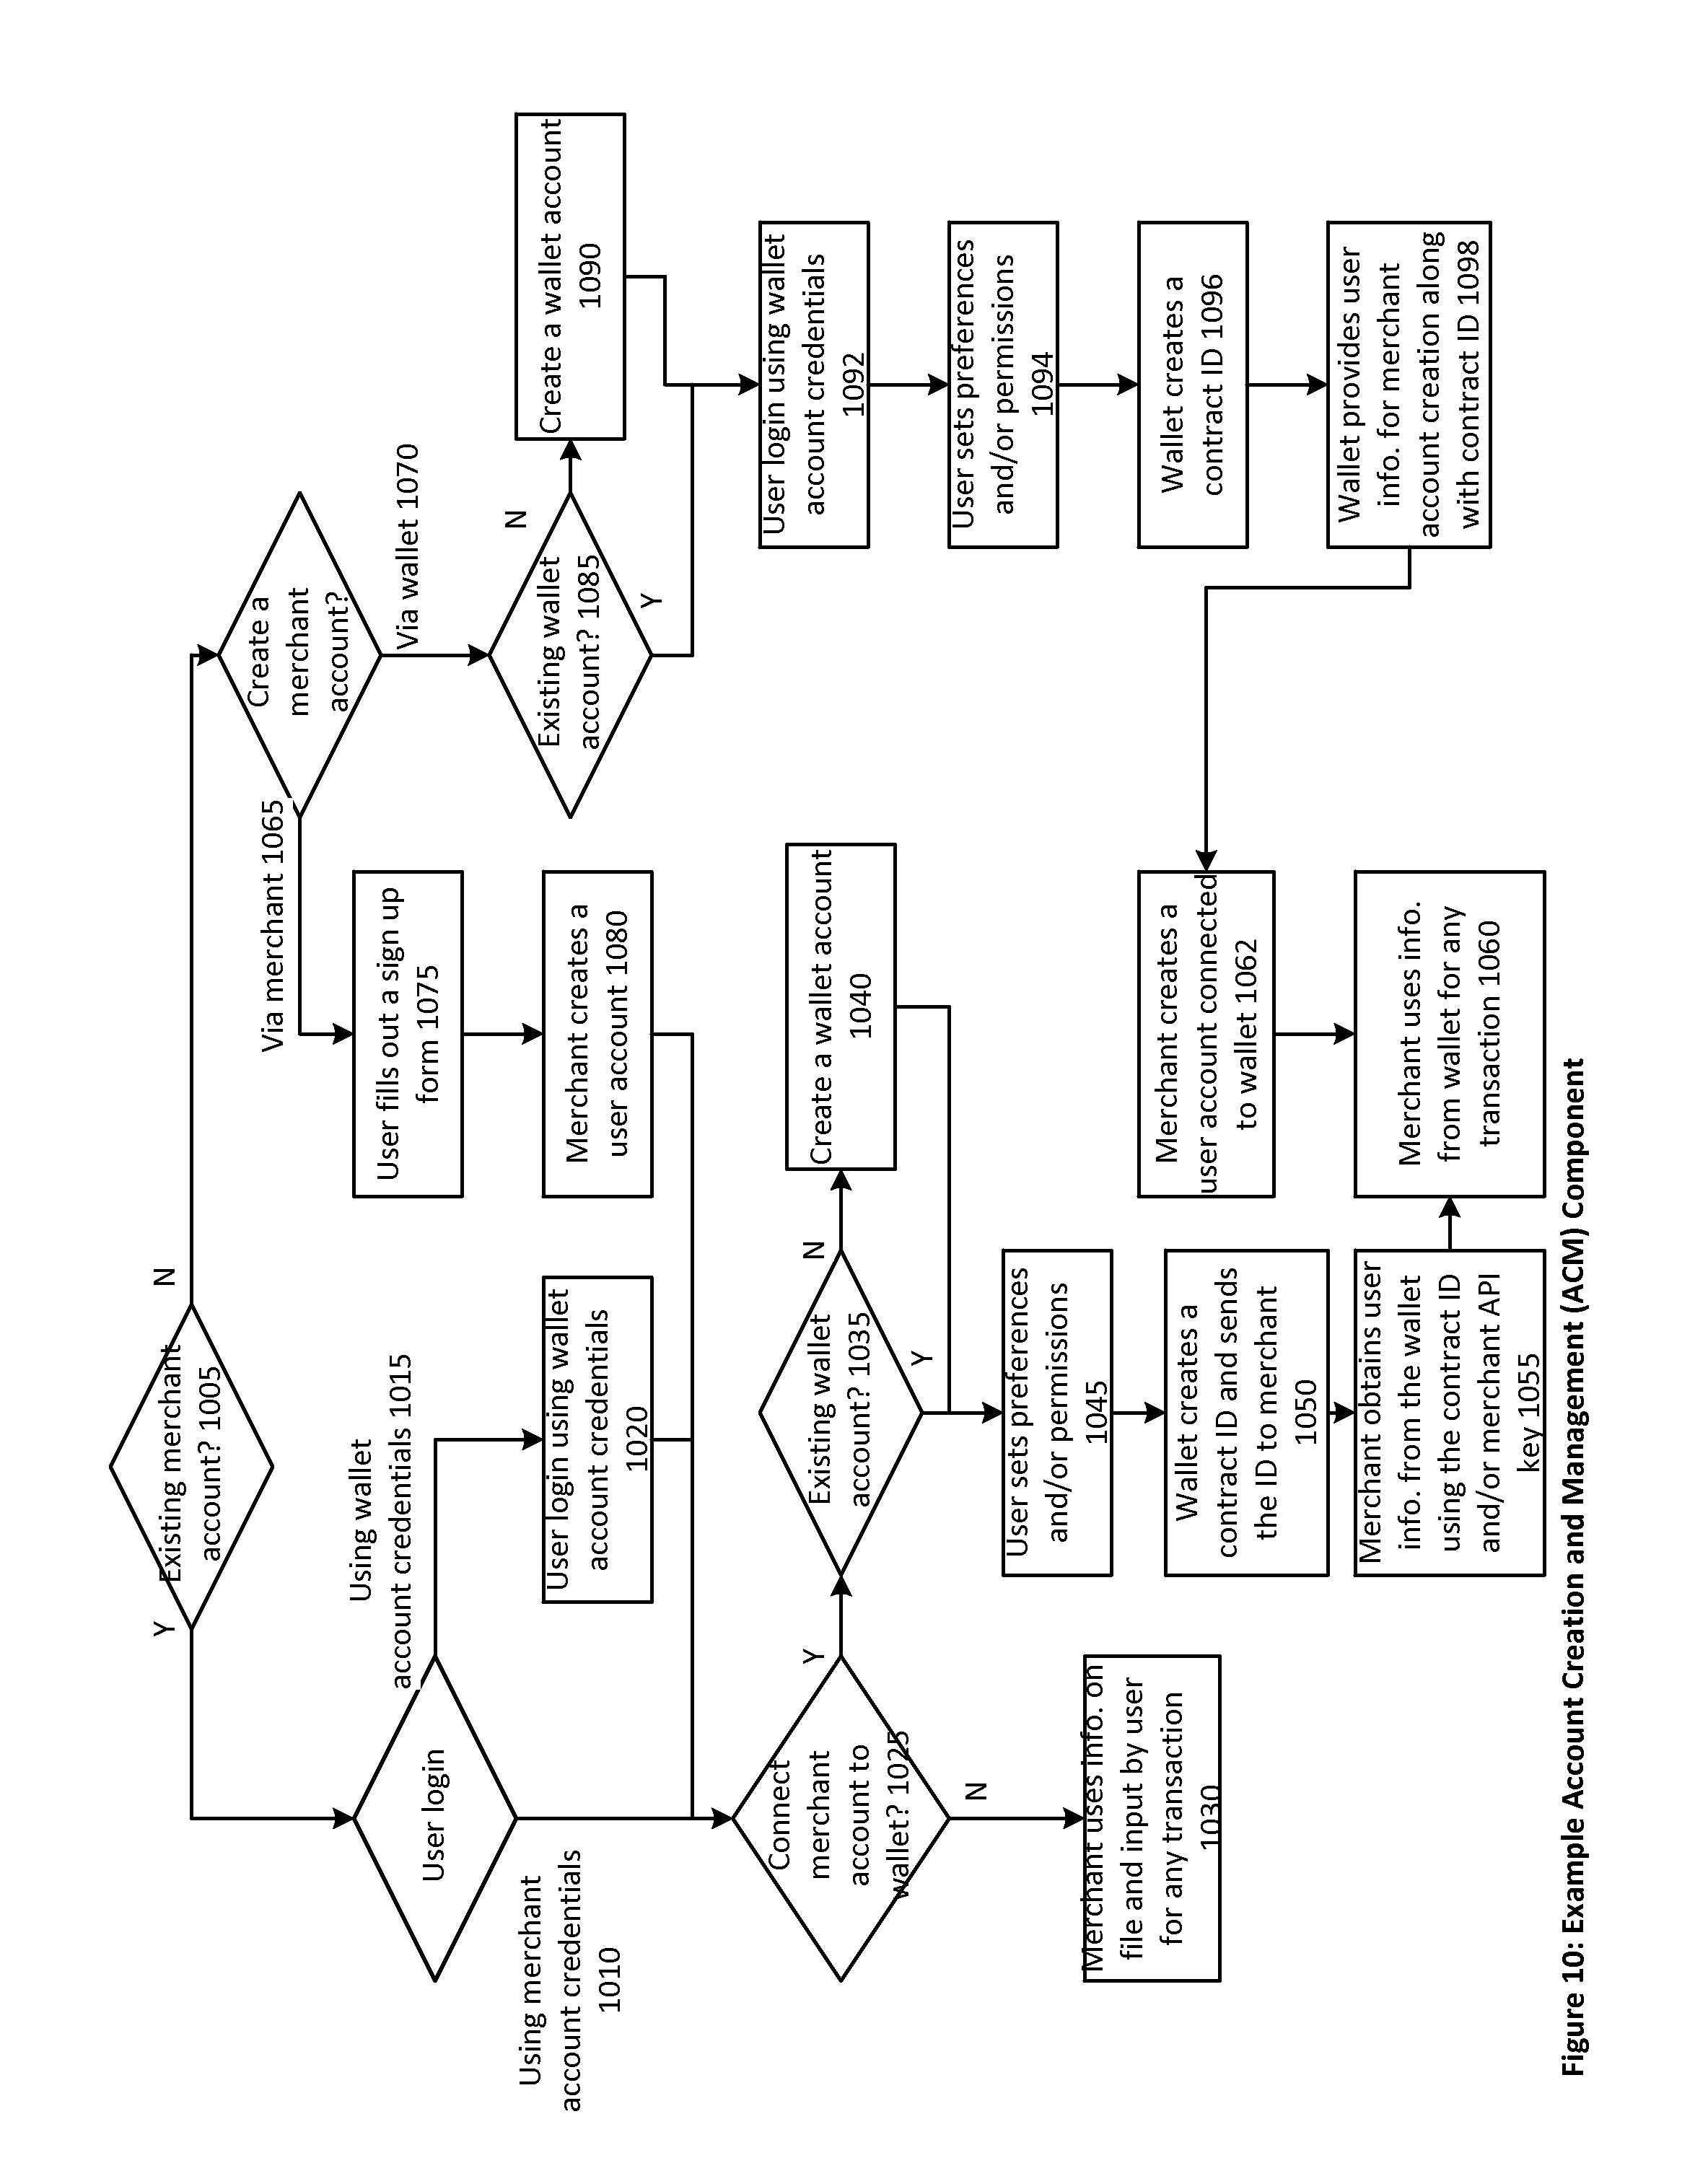 Patent US 9,959,531 B2